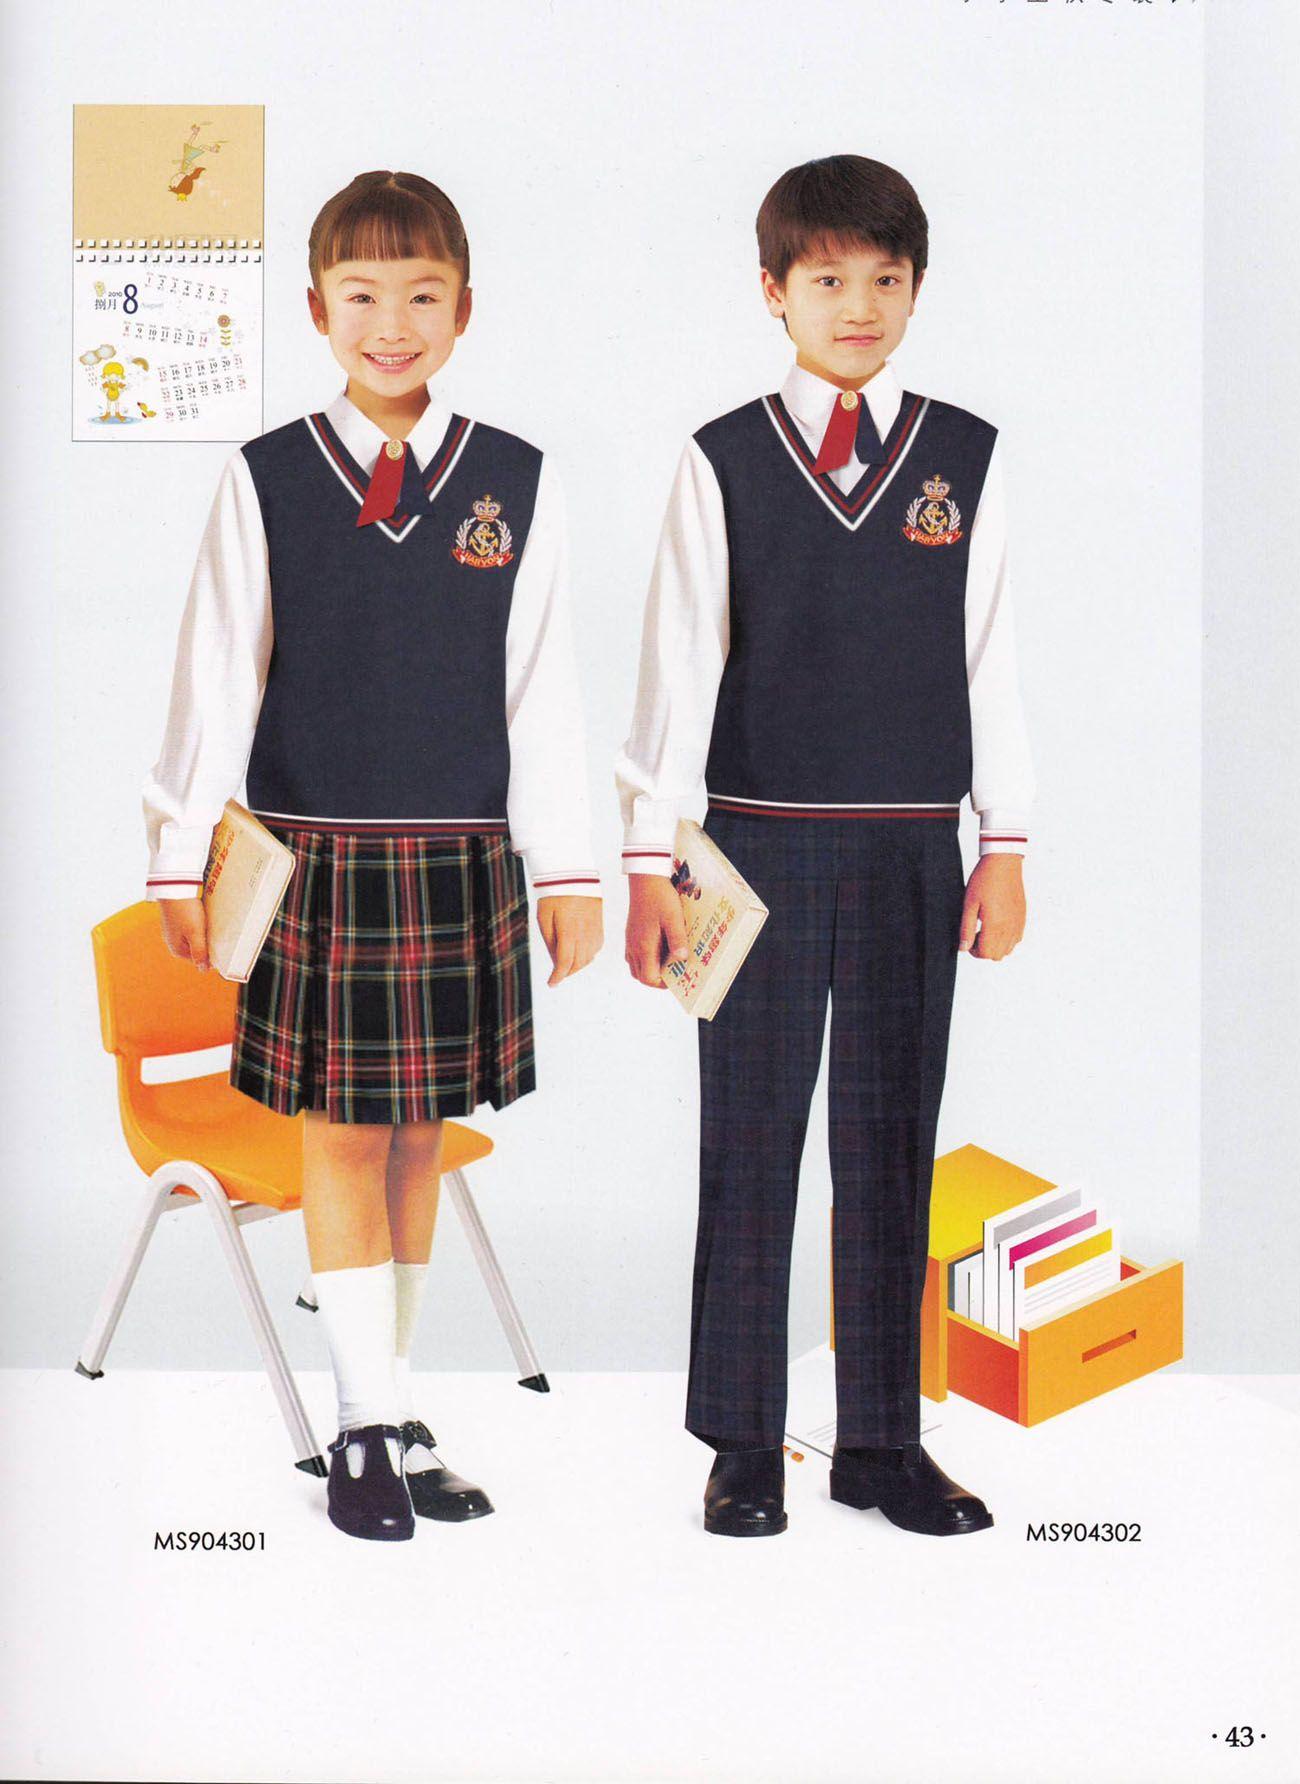 http://image.made-in-china.com/2f0j00tjGTLBqlOfkC/Cotton-Primary-School-Uniform-SH-02-.jpg